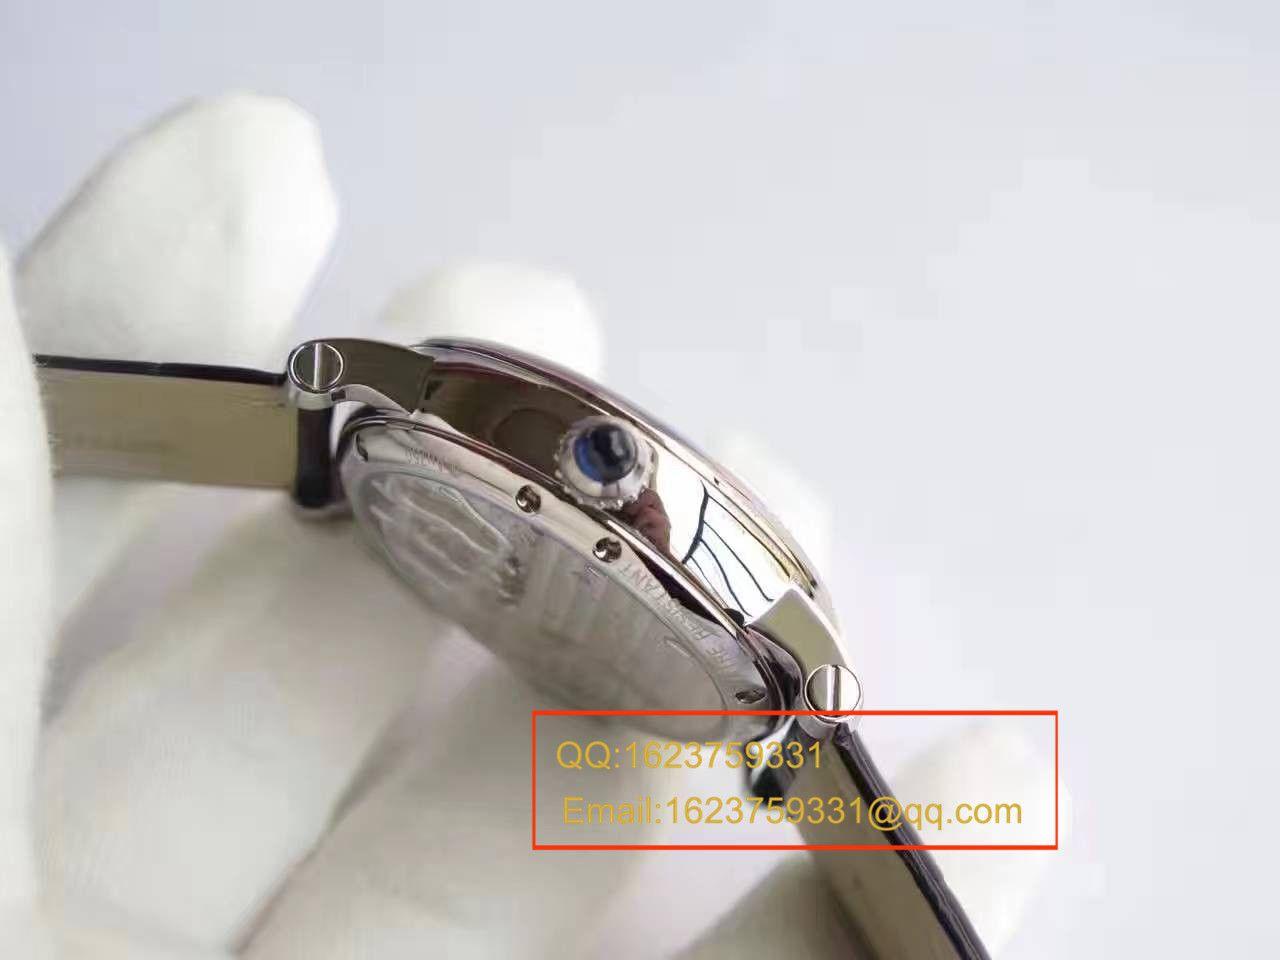 【BL厂一比一精仿手表】卡地亚ROTONDE DE CARTIER系列W1556216陀飞轮腕表